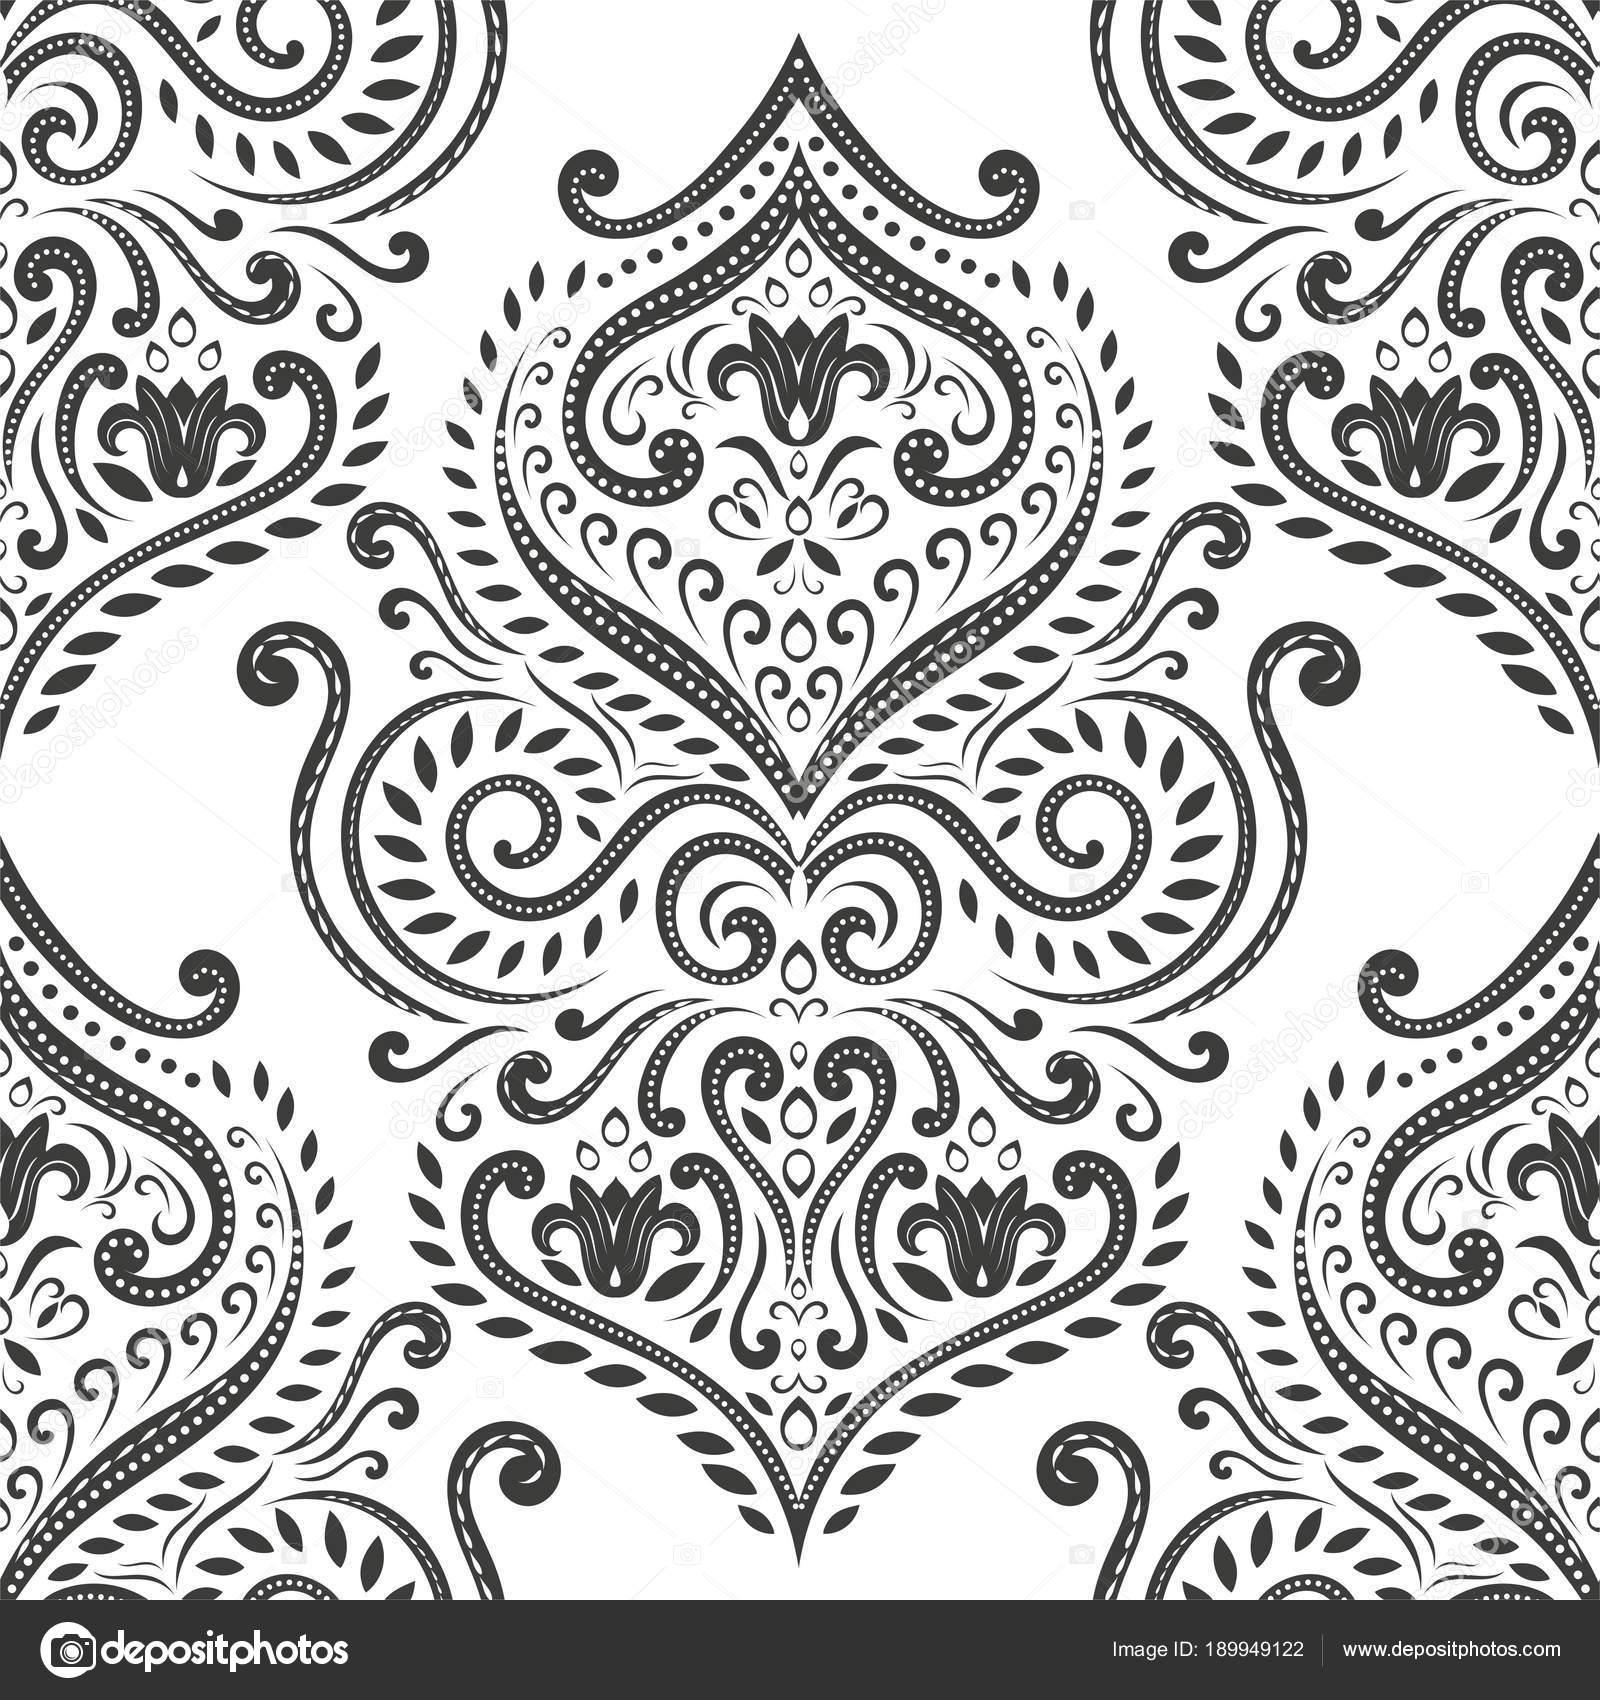 depositphotos 189949122 stock illustration black and white damask vector